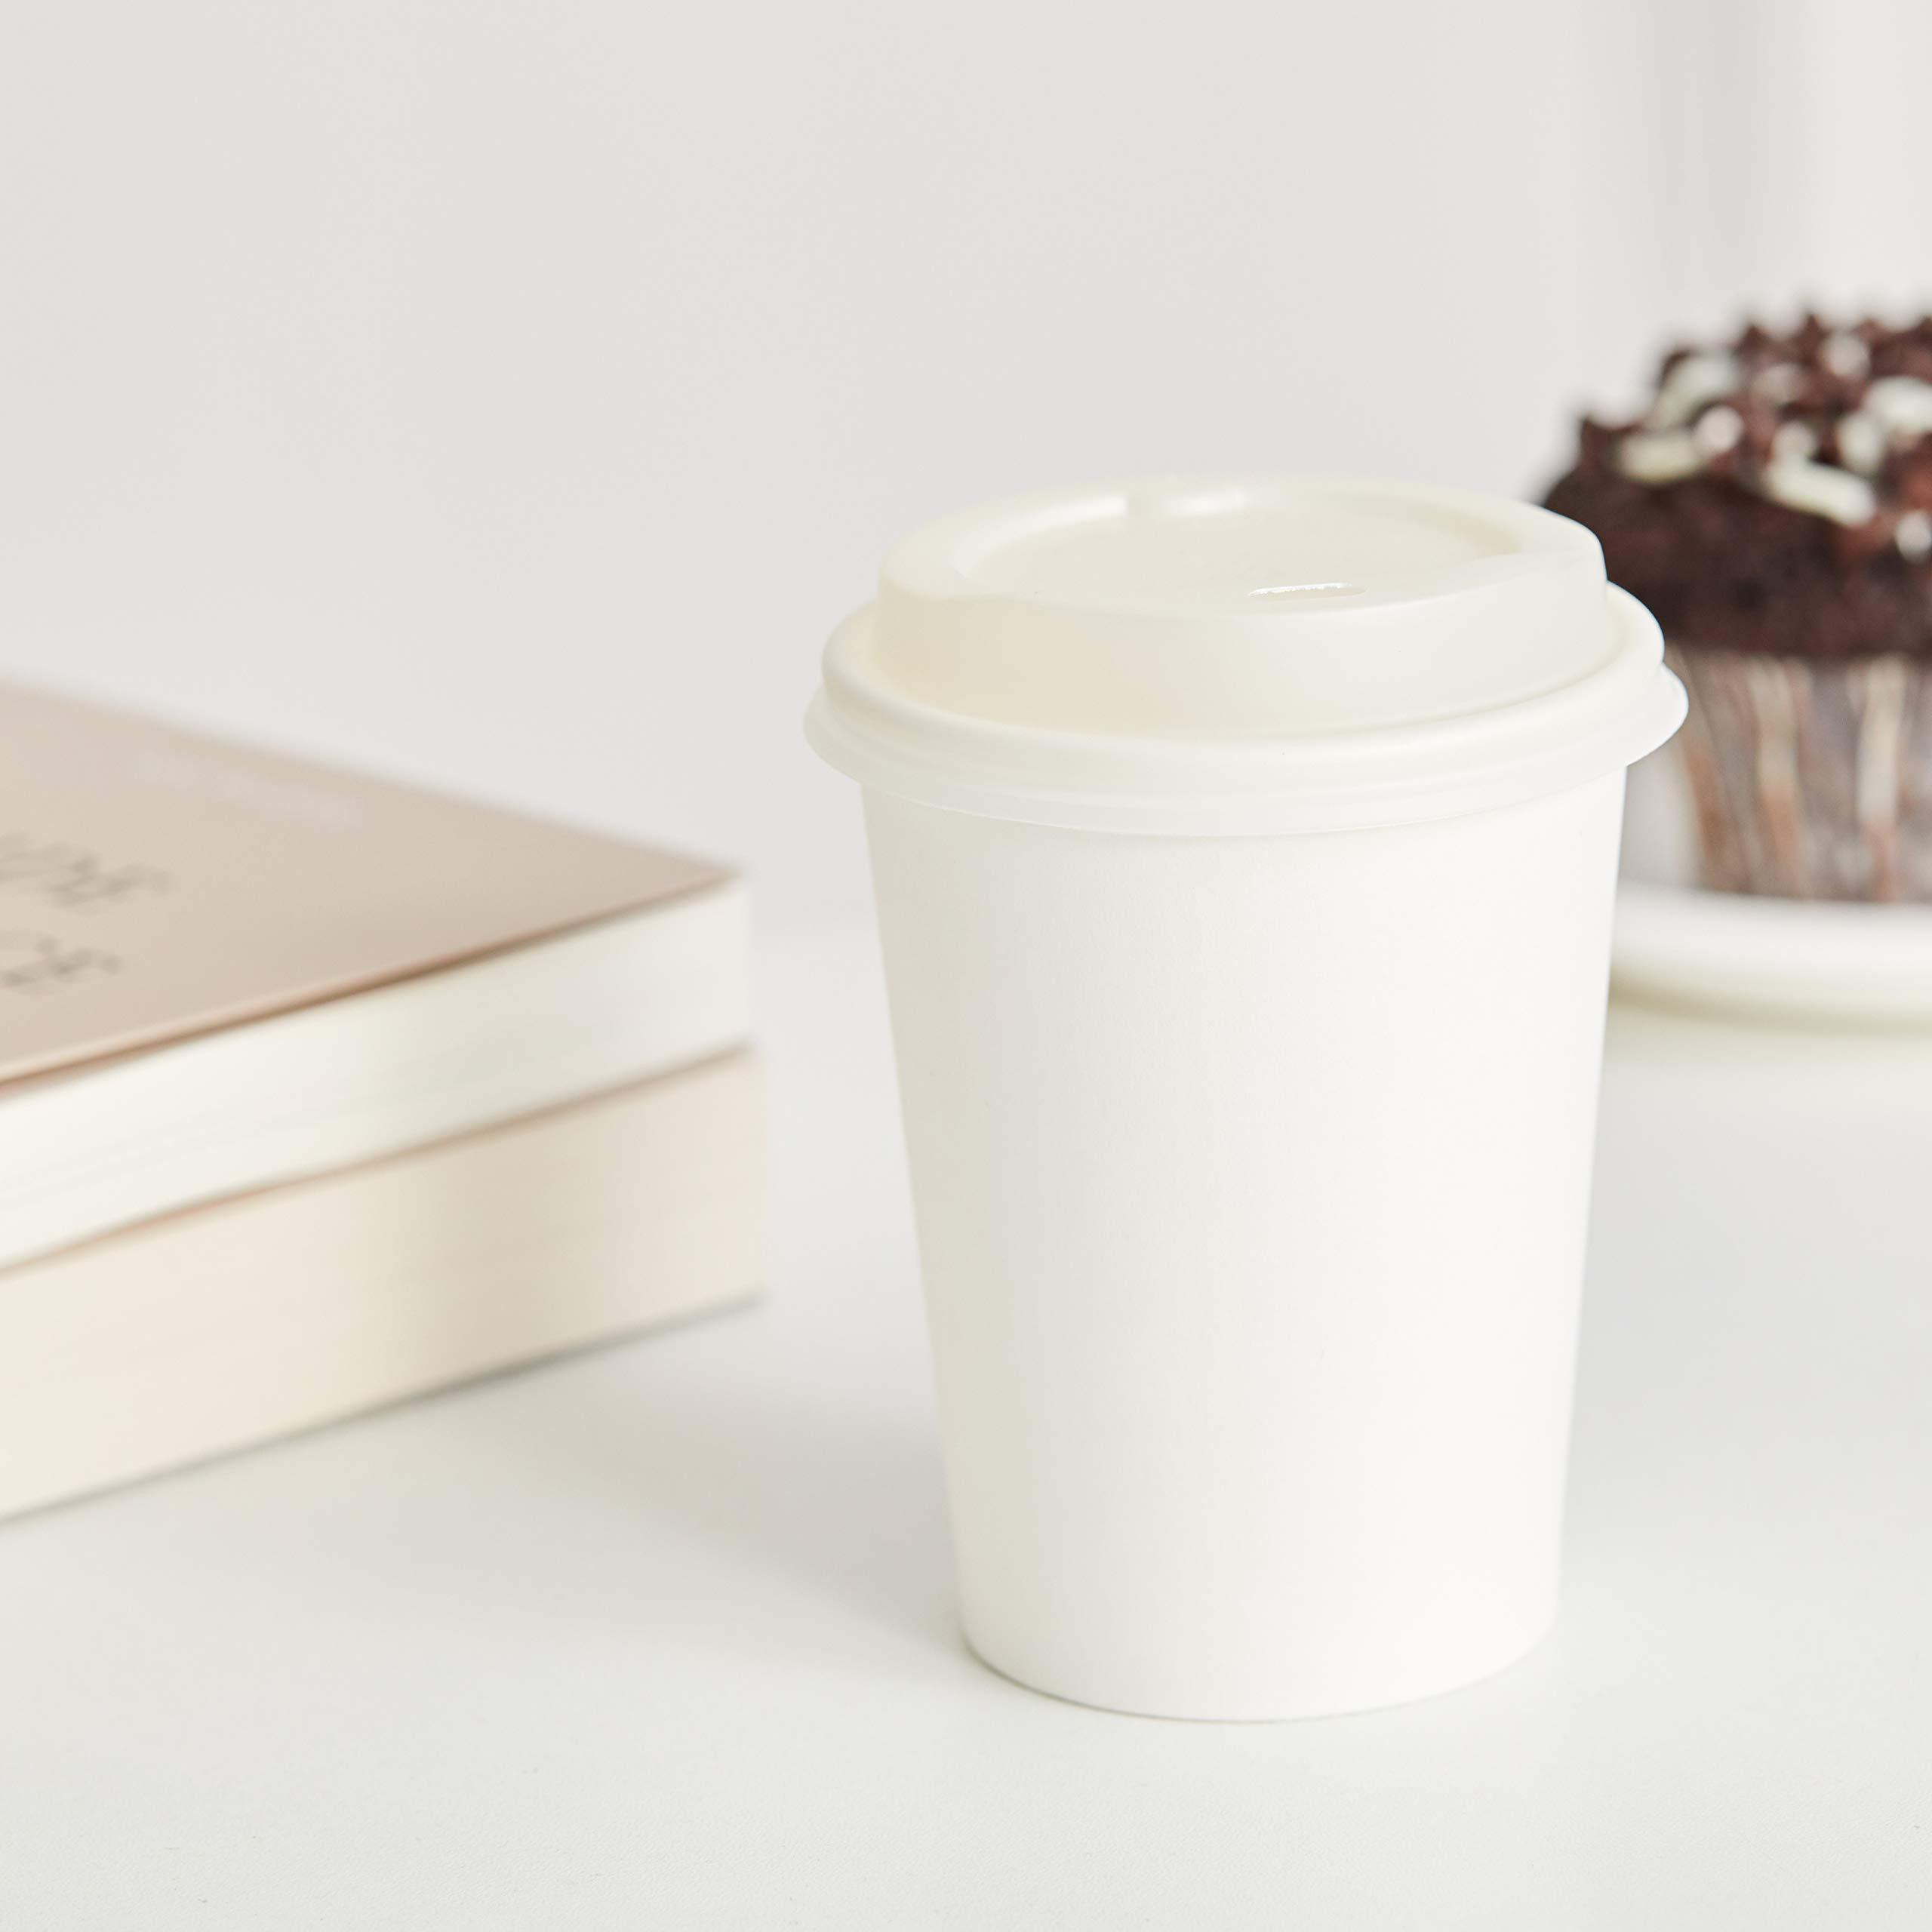 AmazonBasics 8 oz. Compostable PLA Laminated Hot Paper Cup, 1,000-Count by AmazonBasics (Image #2)